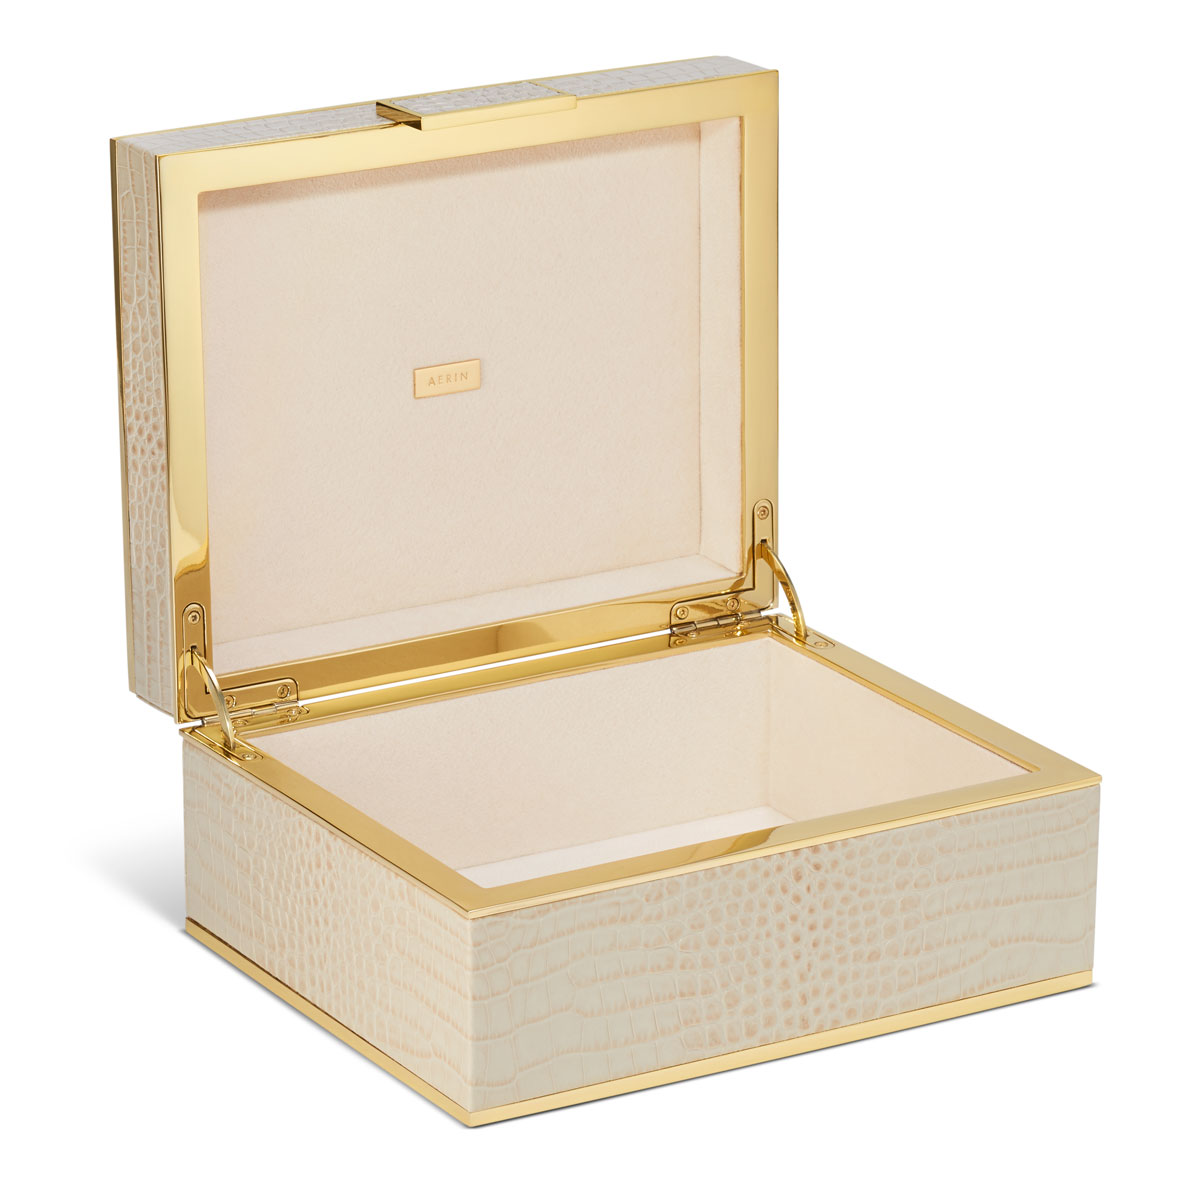 Aerin Classic Croc Small Jewelry Box, Fawn